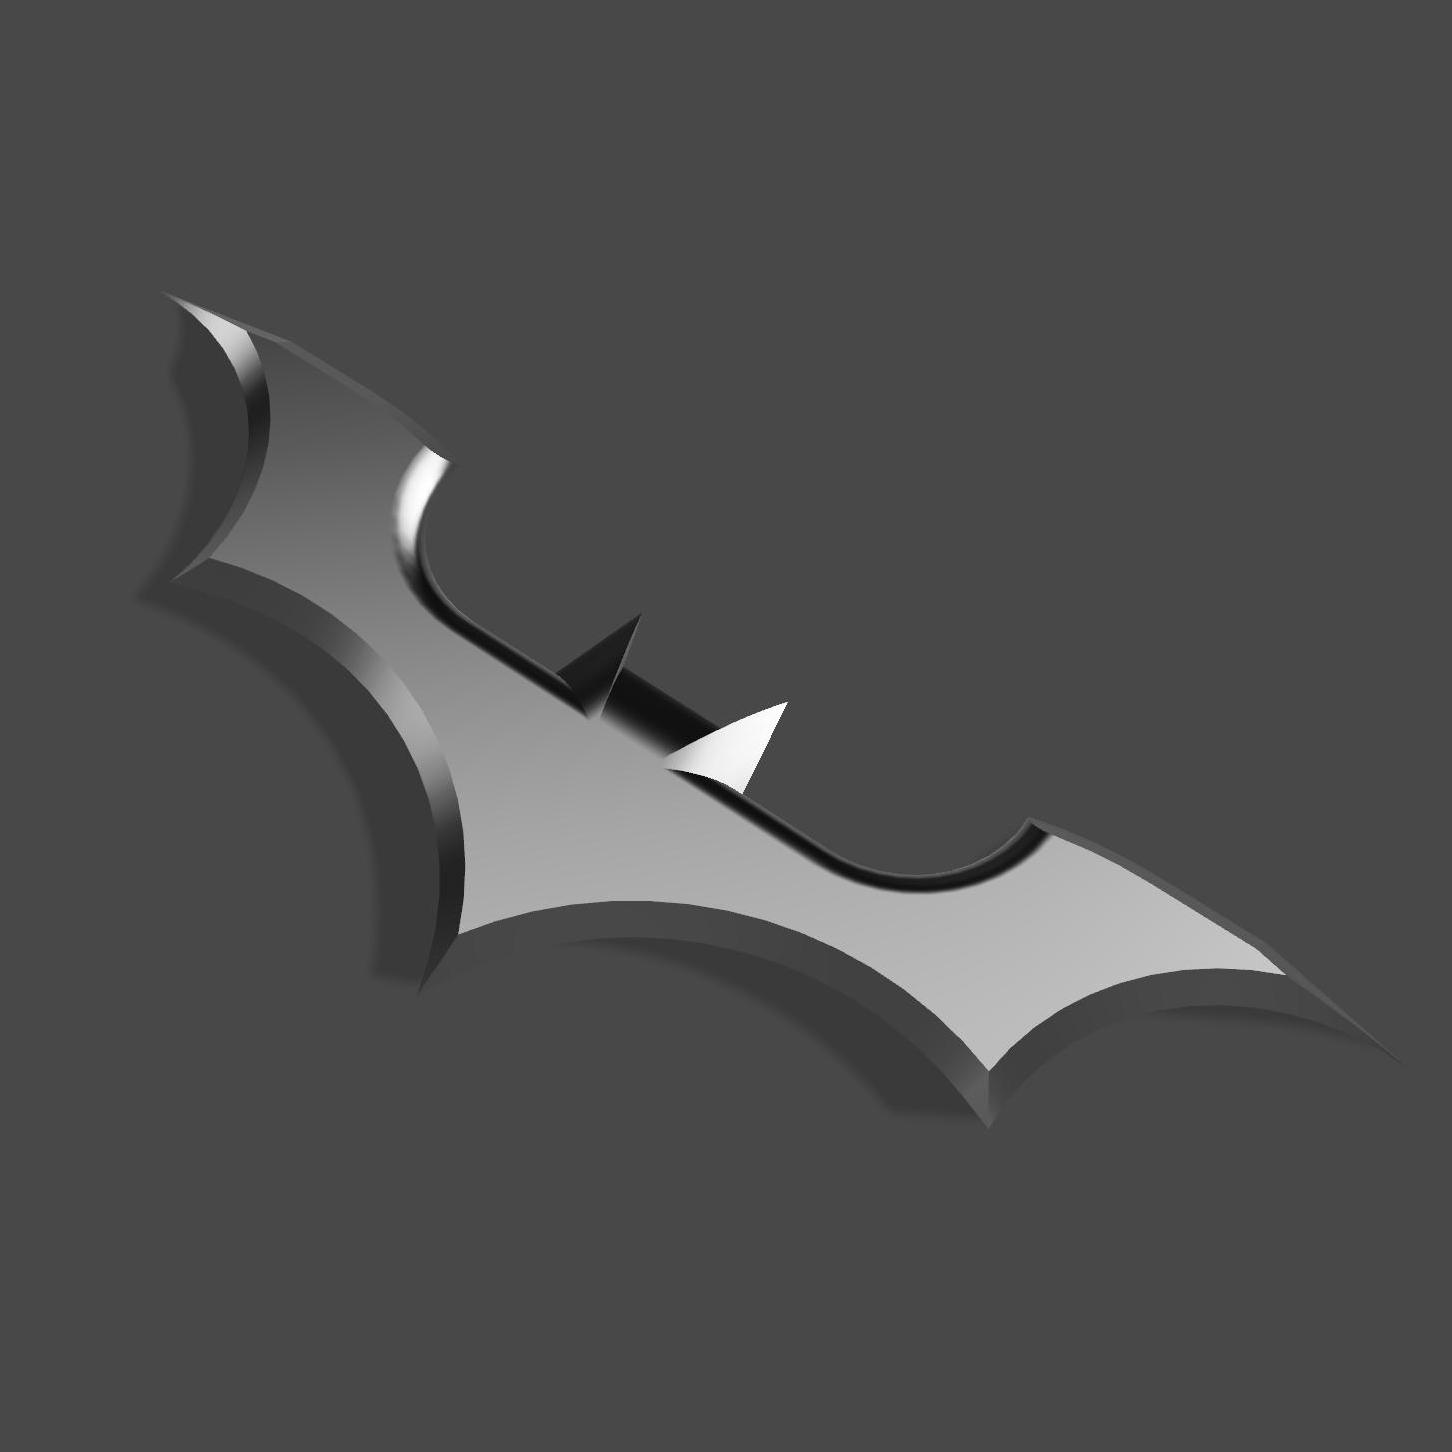 b3.jpg Download free STL file BATARANG v1.0 • Design to 3D print, jediSam